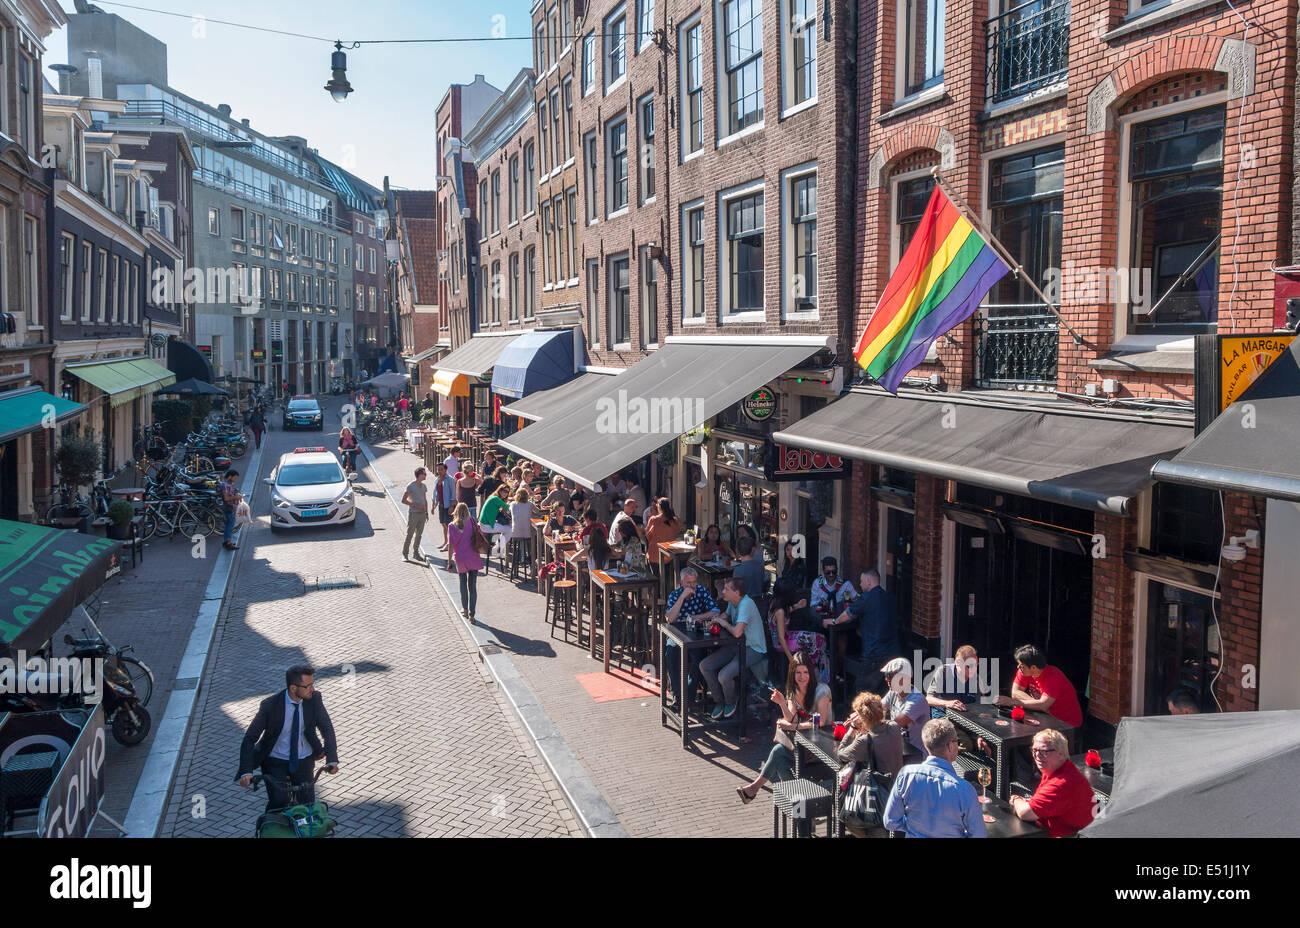 http://c7.alamy.com/comp/E51J1Y/amsterdam-reguliersdwars-reguliersdwarsstraat-outdoor-bars-rainbow-E51J1Y.jpg